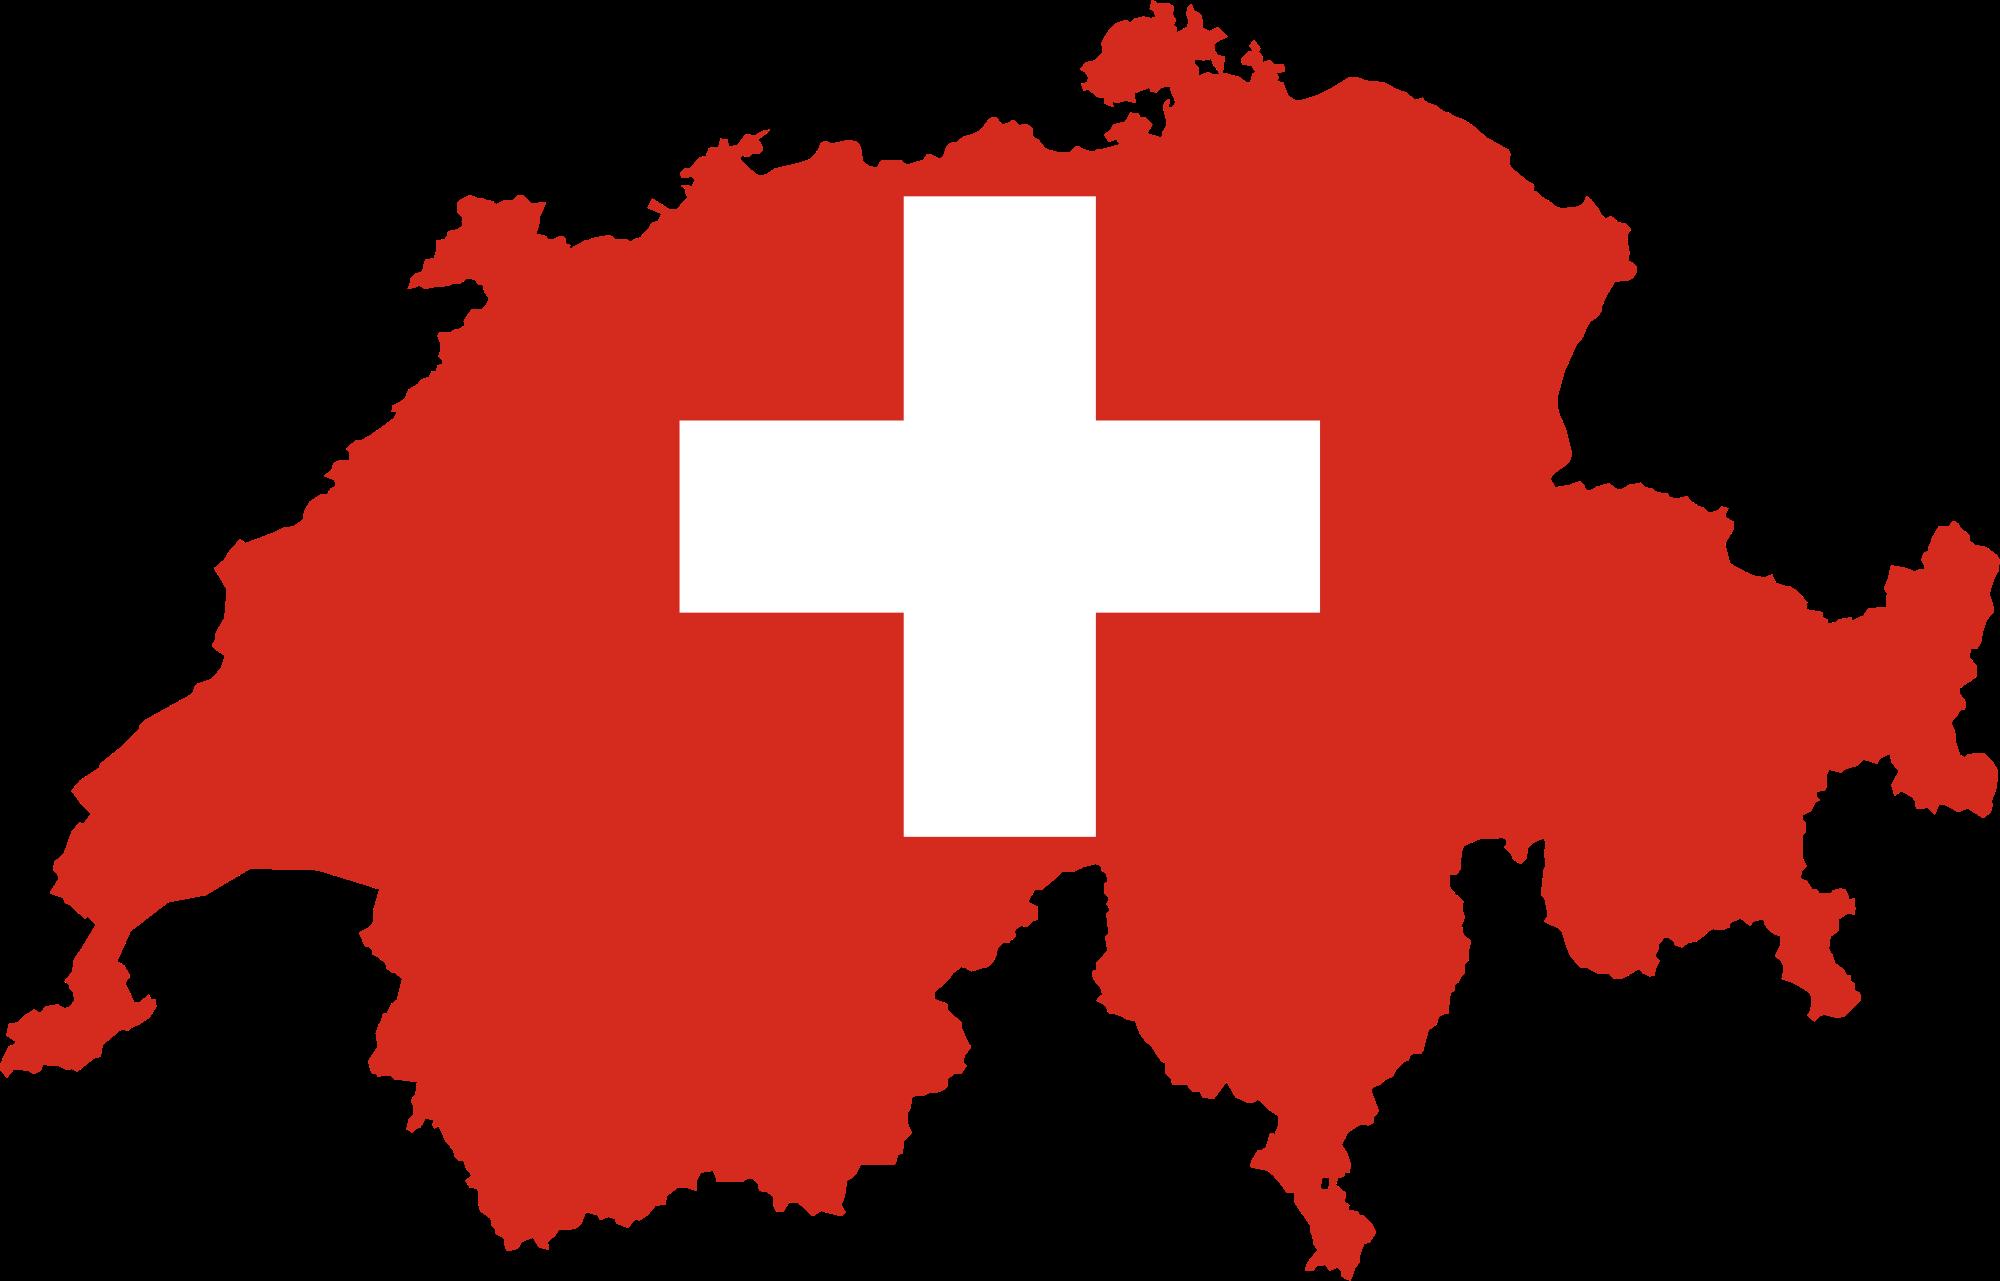 Switzerland PNG - 11055